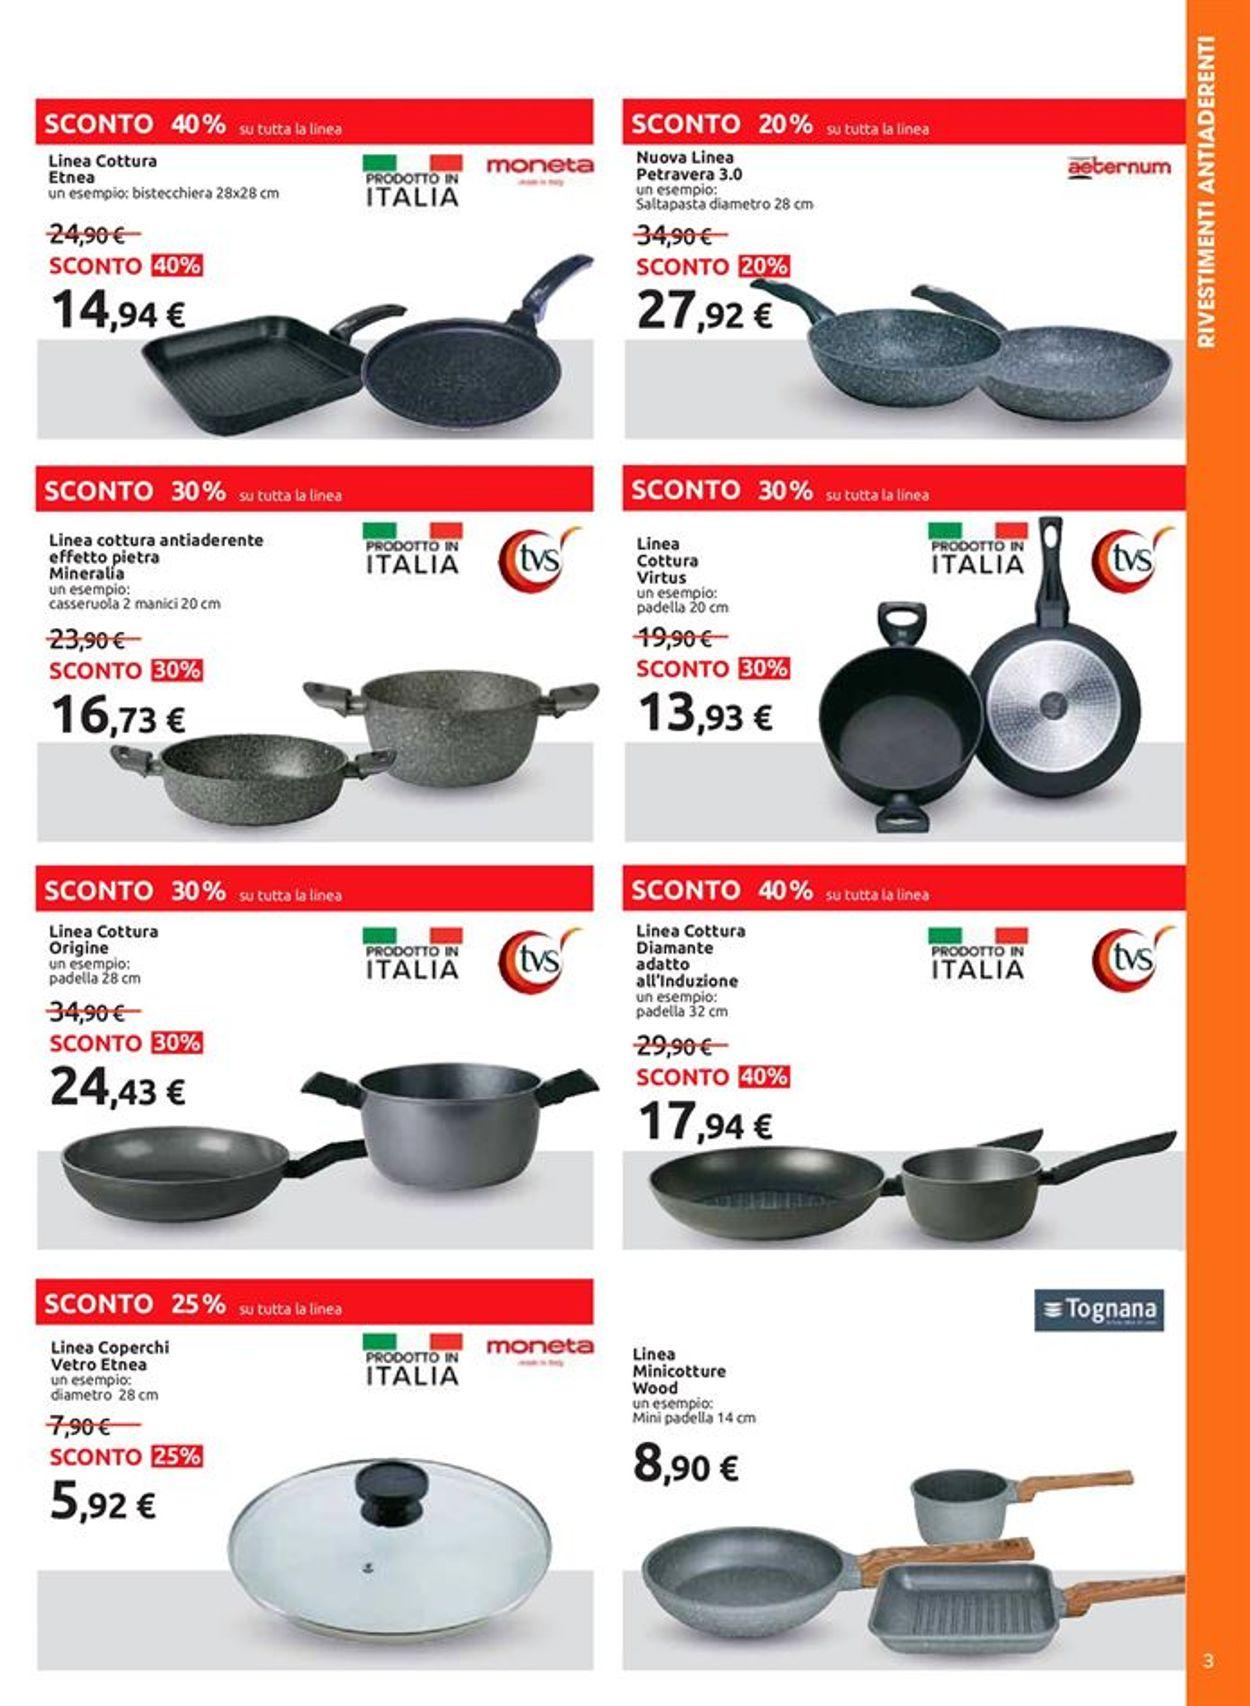 Volantino Carrefour Iper - Offerte 15/01-07/02/2021 (Pagina 3)